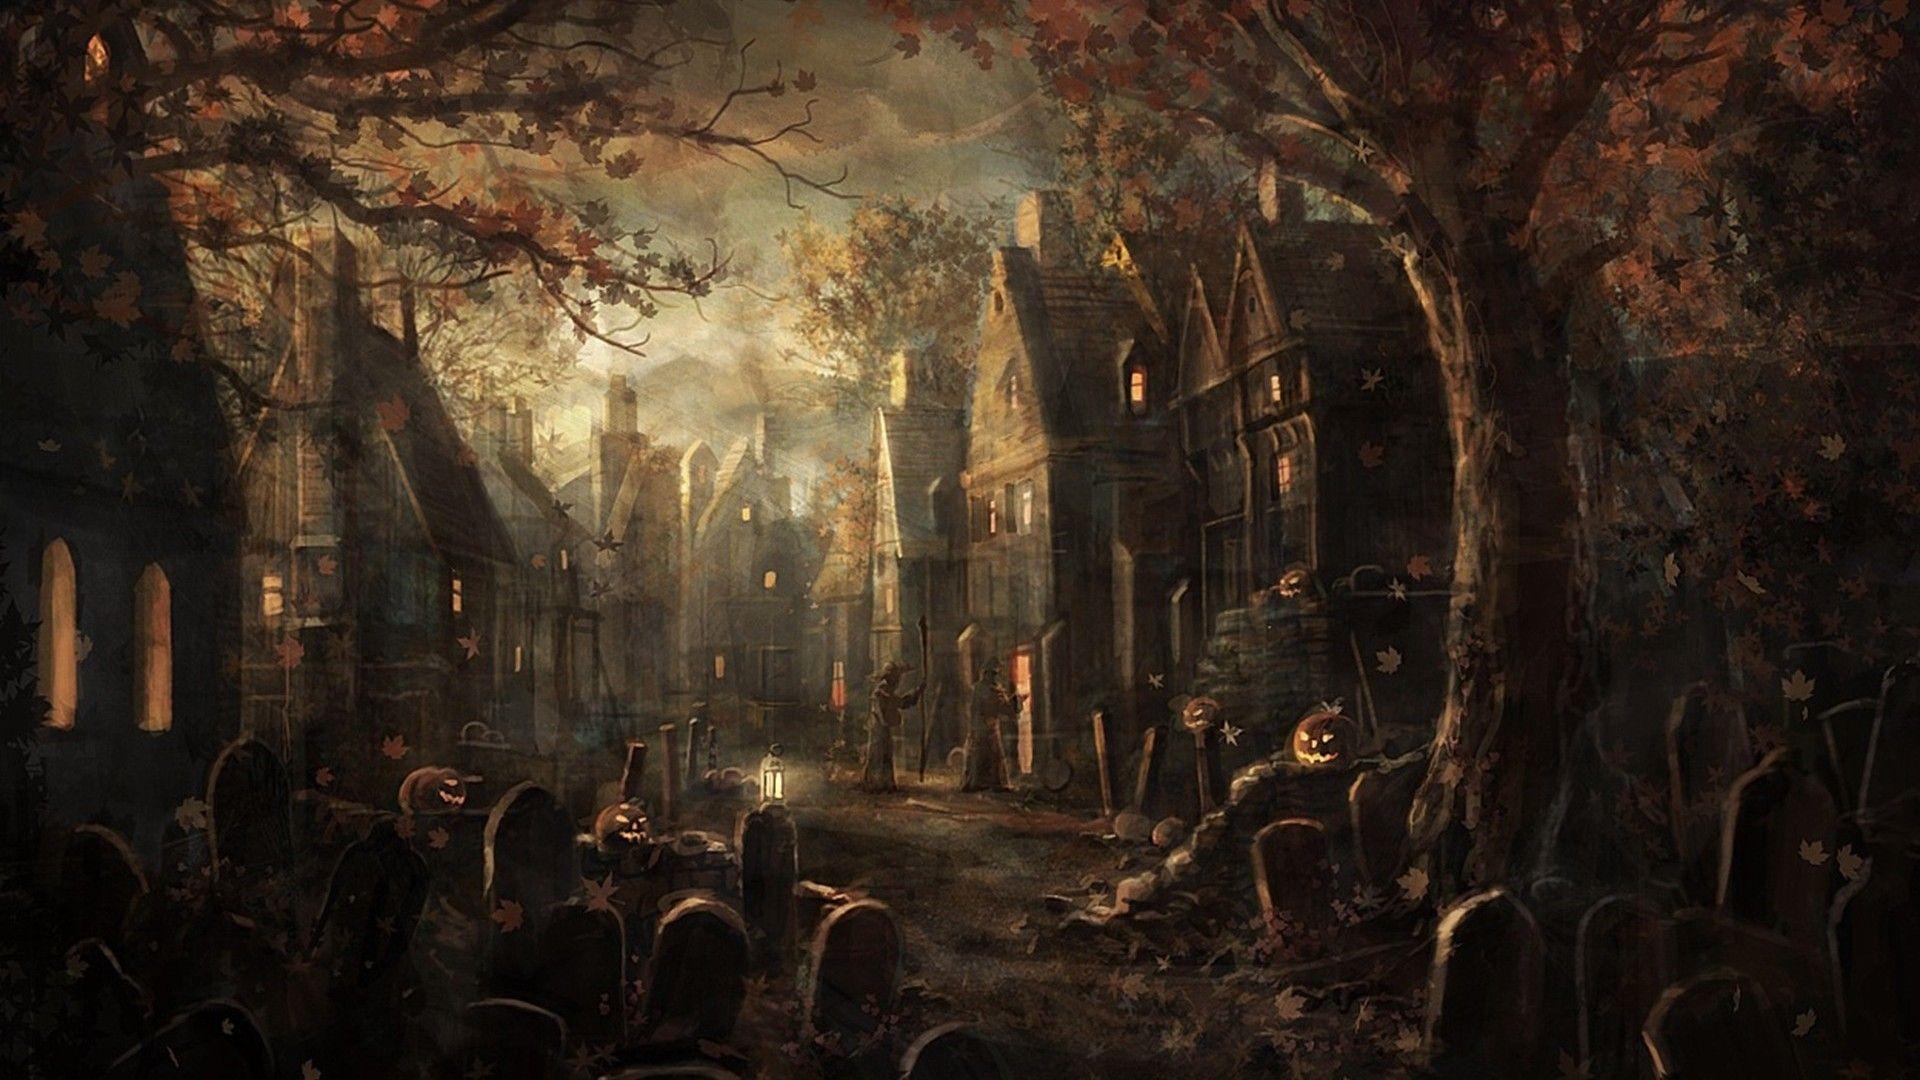 Halloween Wallpaper Hd Cerca Con Google Halloween